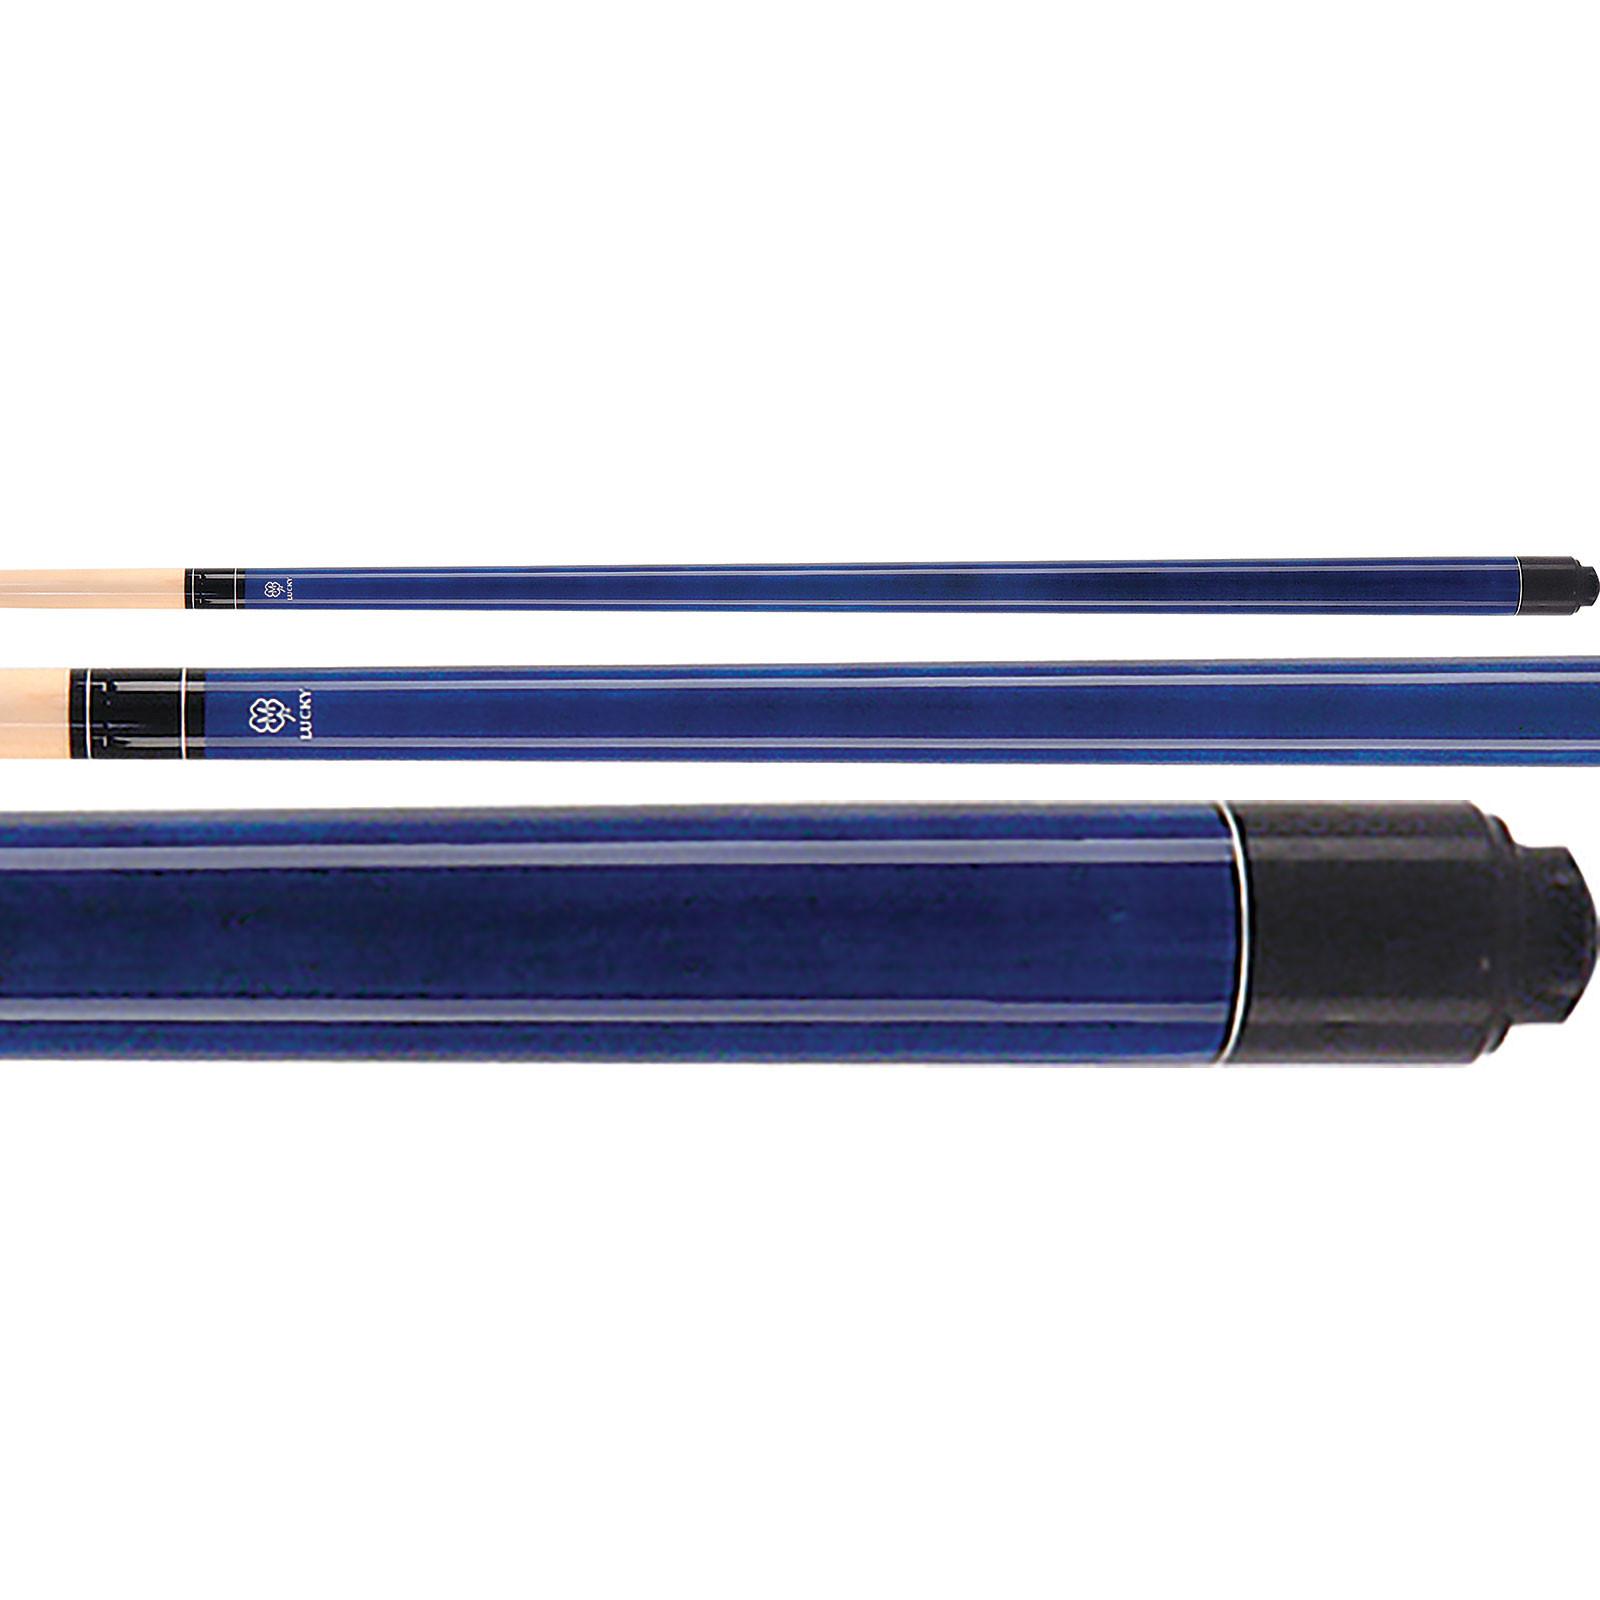 Mcdermott Lucky Pool Cue Stick L2 Blue